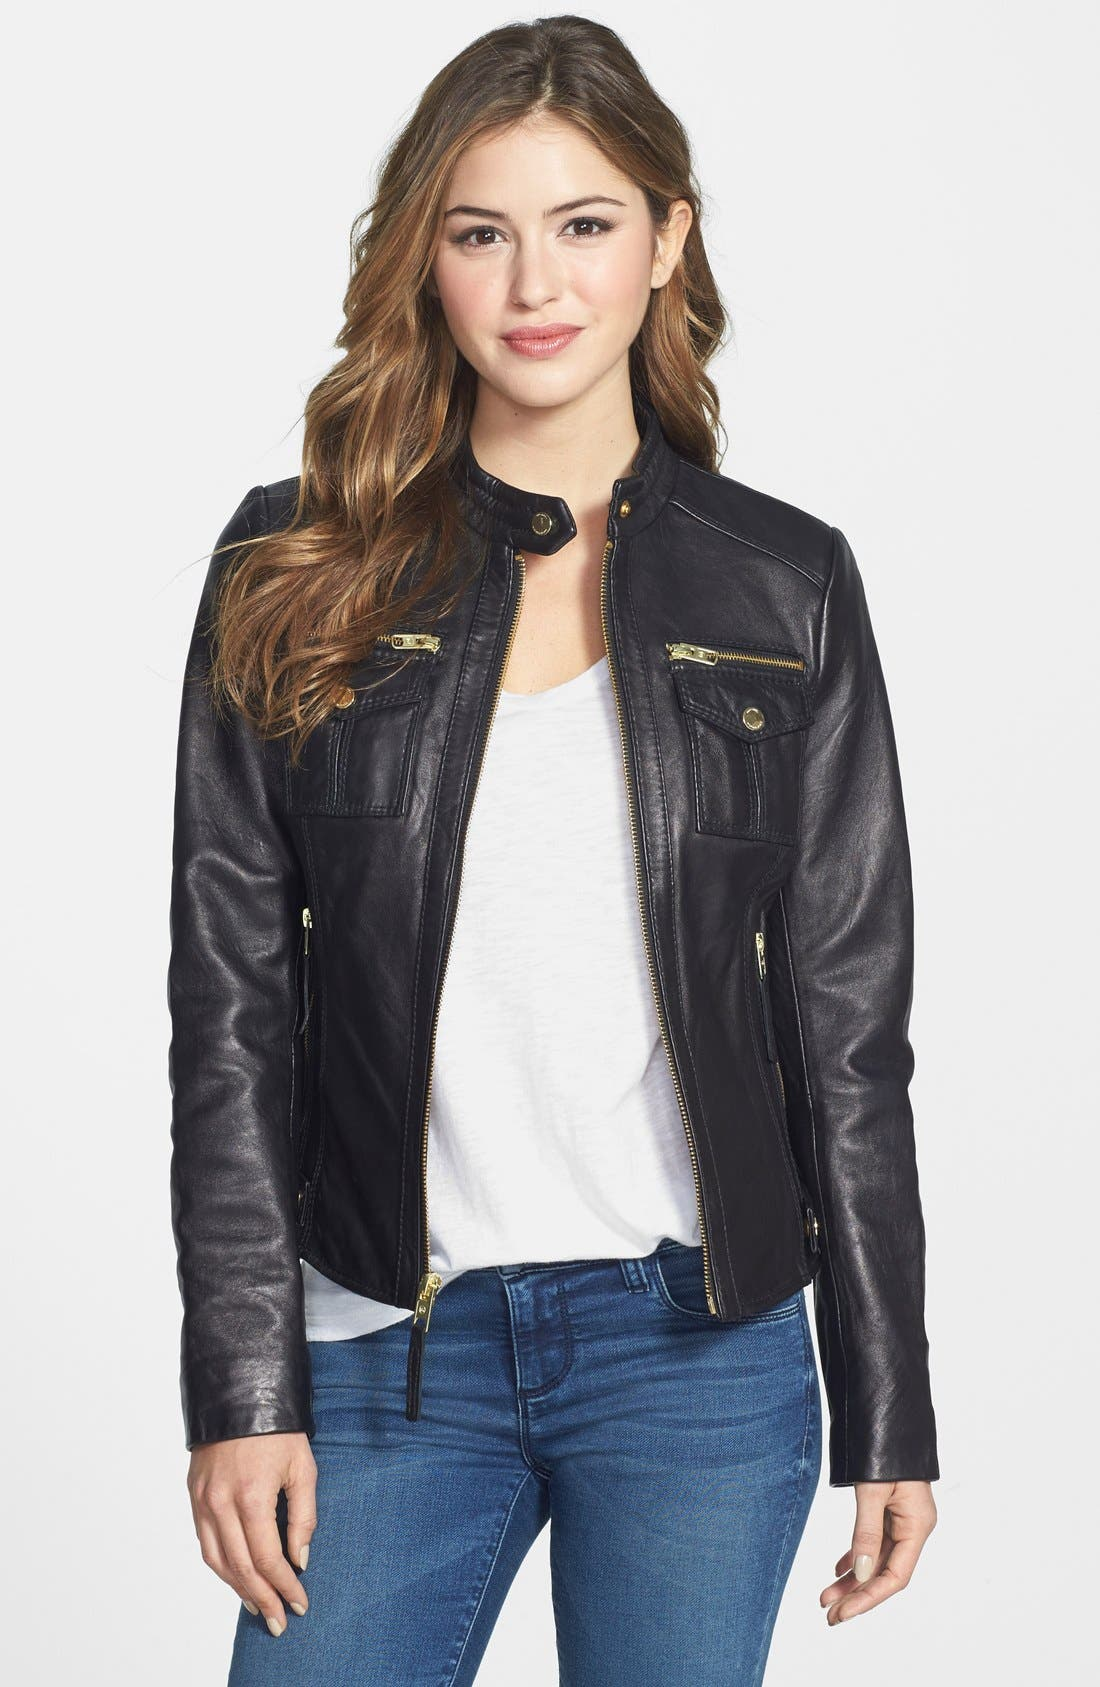 Michael kors leather jackets women